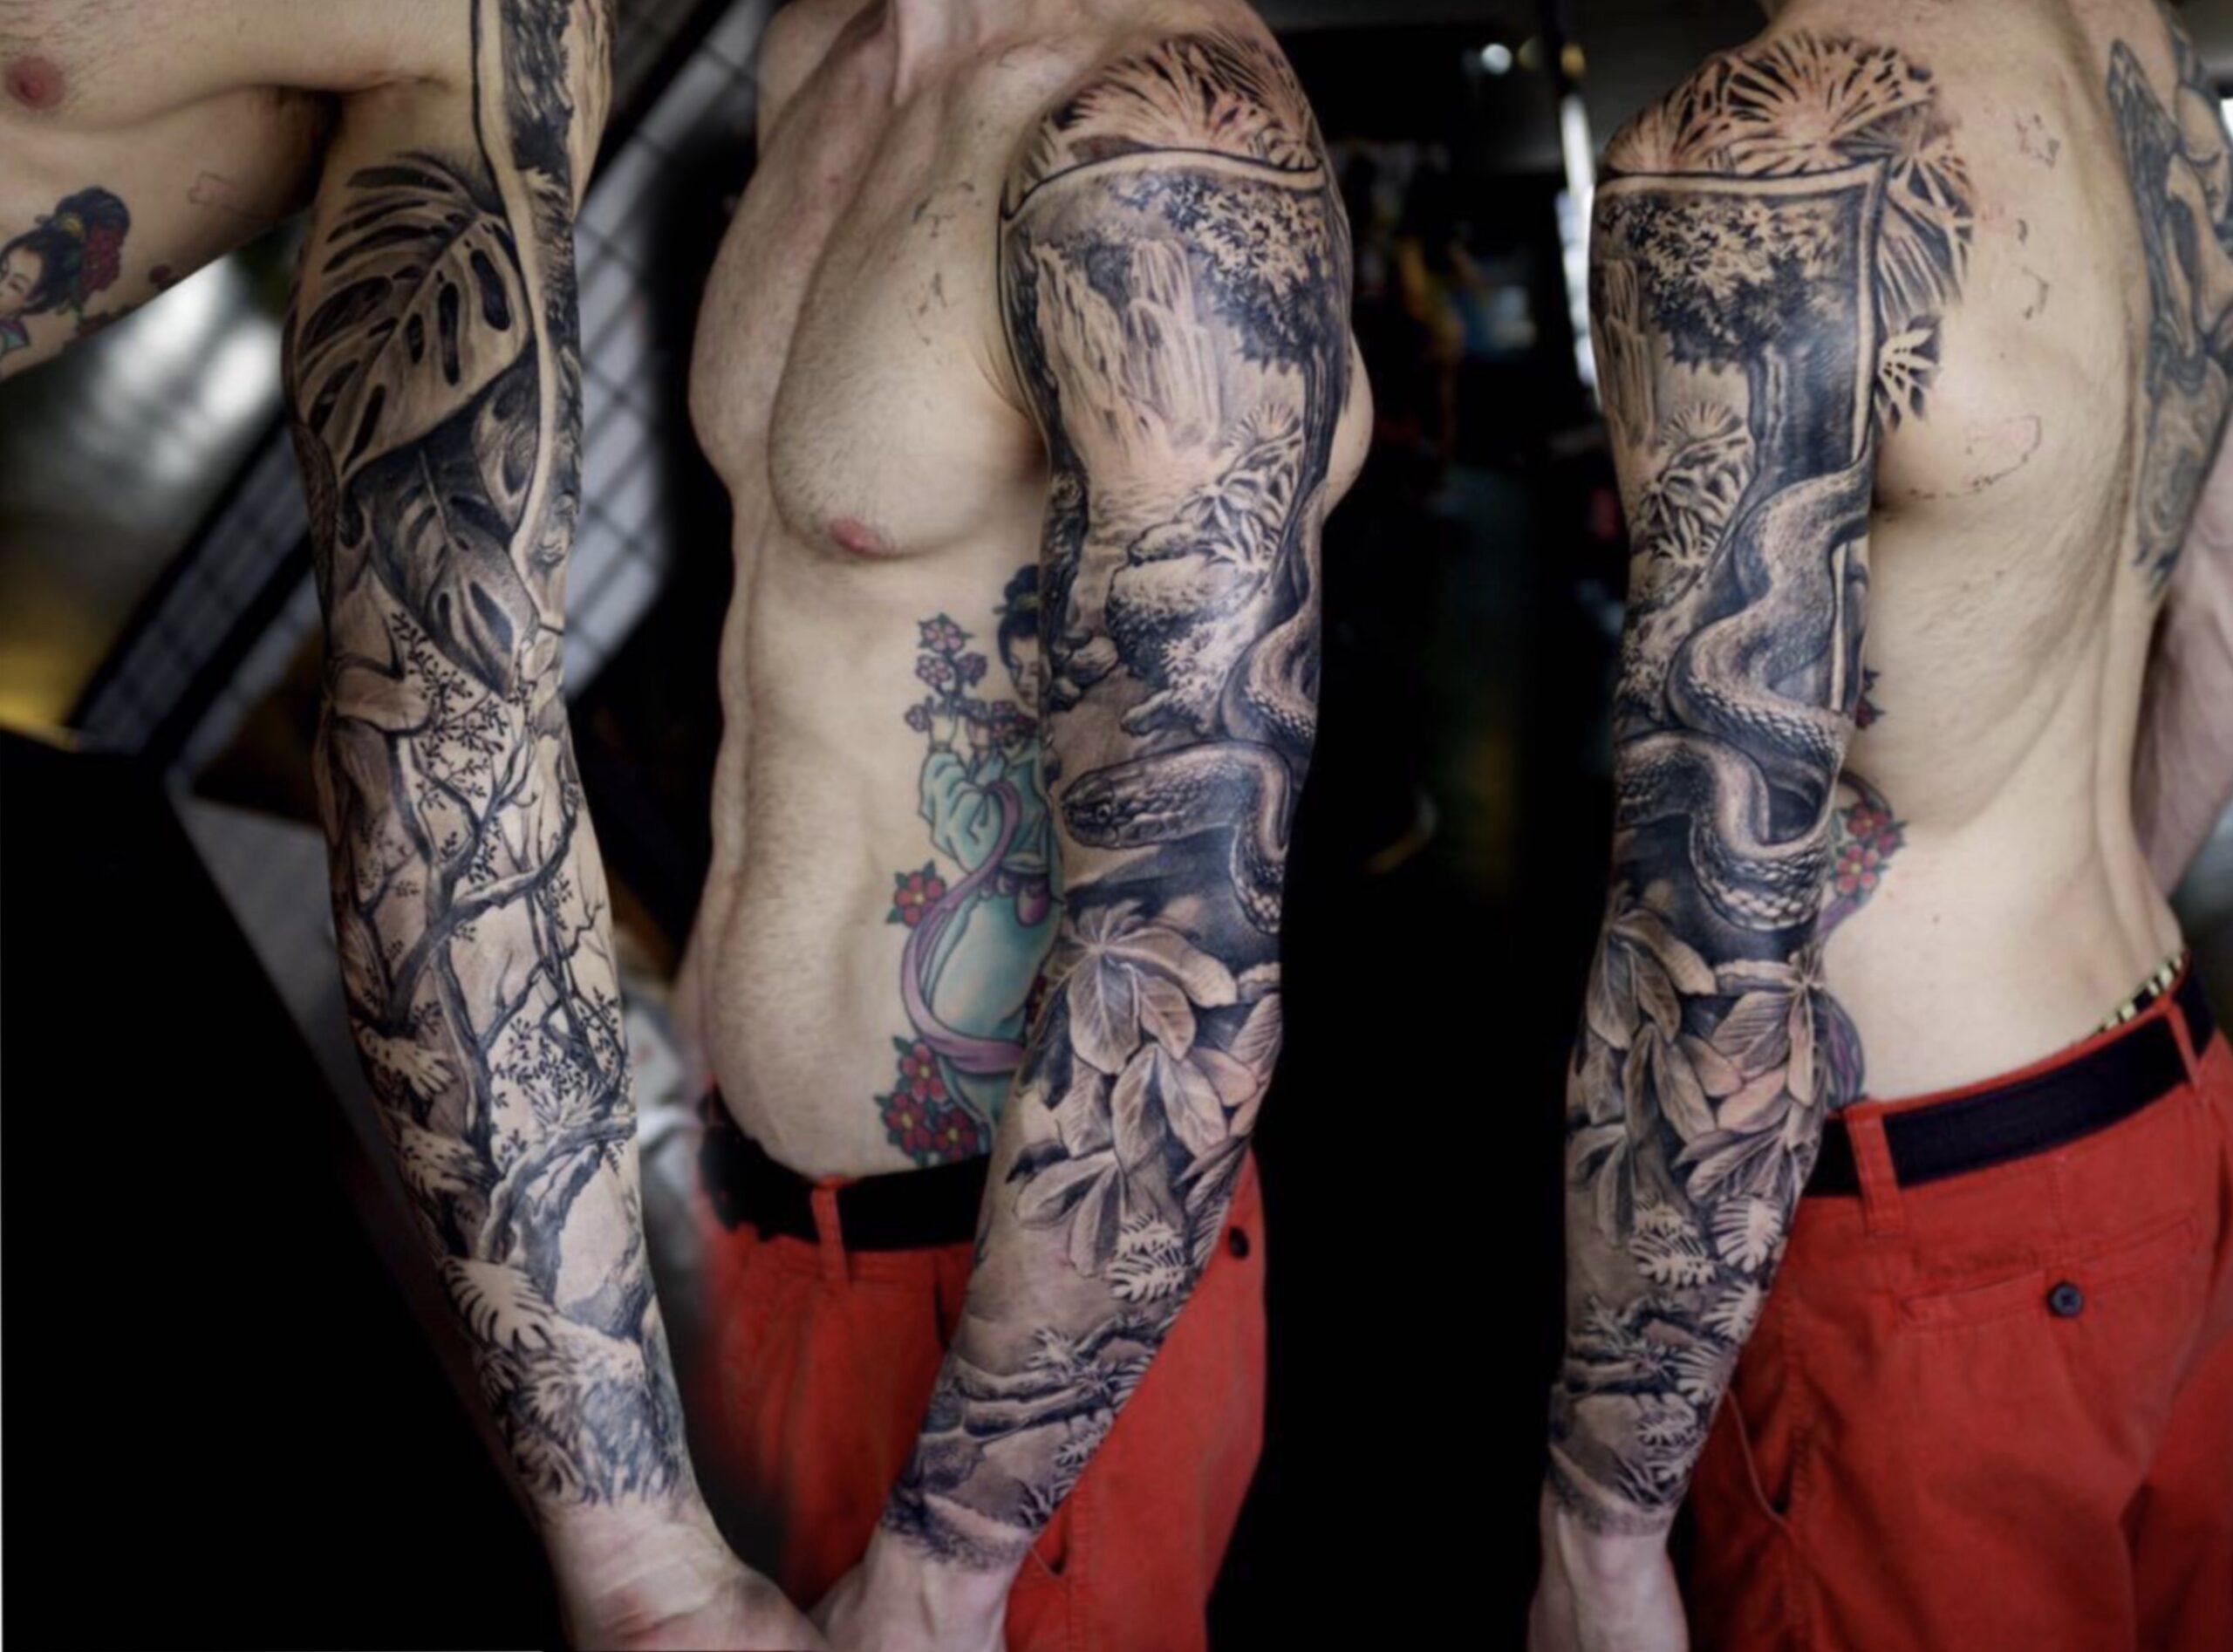 zhuo dan ting tattoo work 卓丹婷纹身作品 花臂丛林设计纹身 1